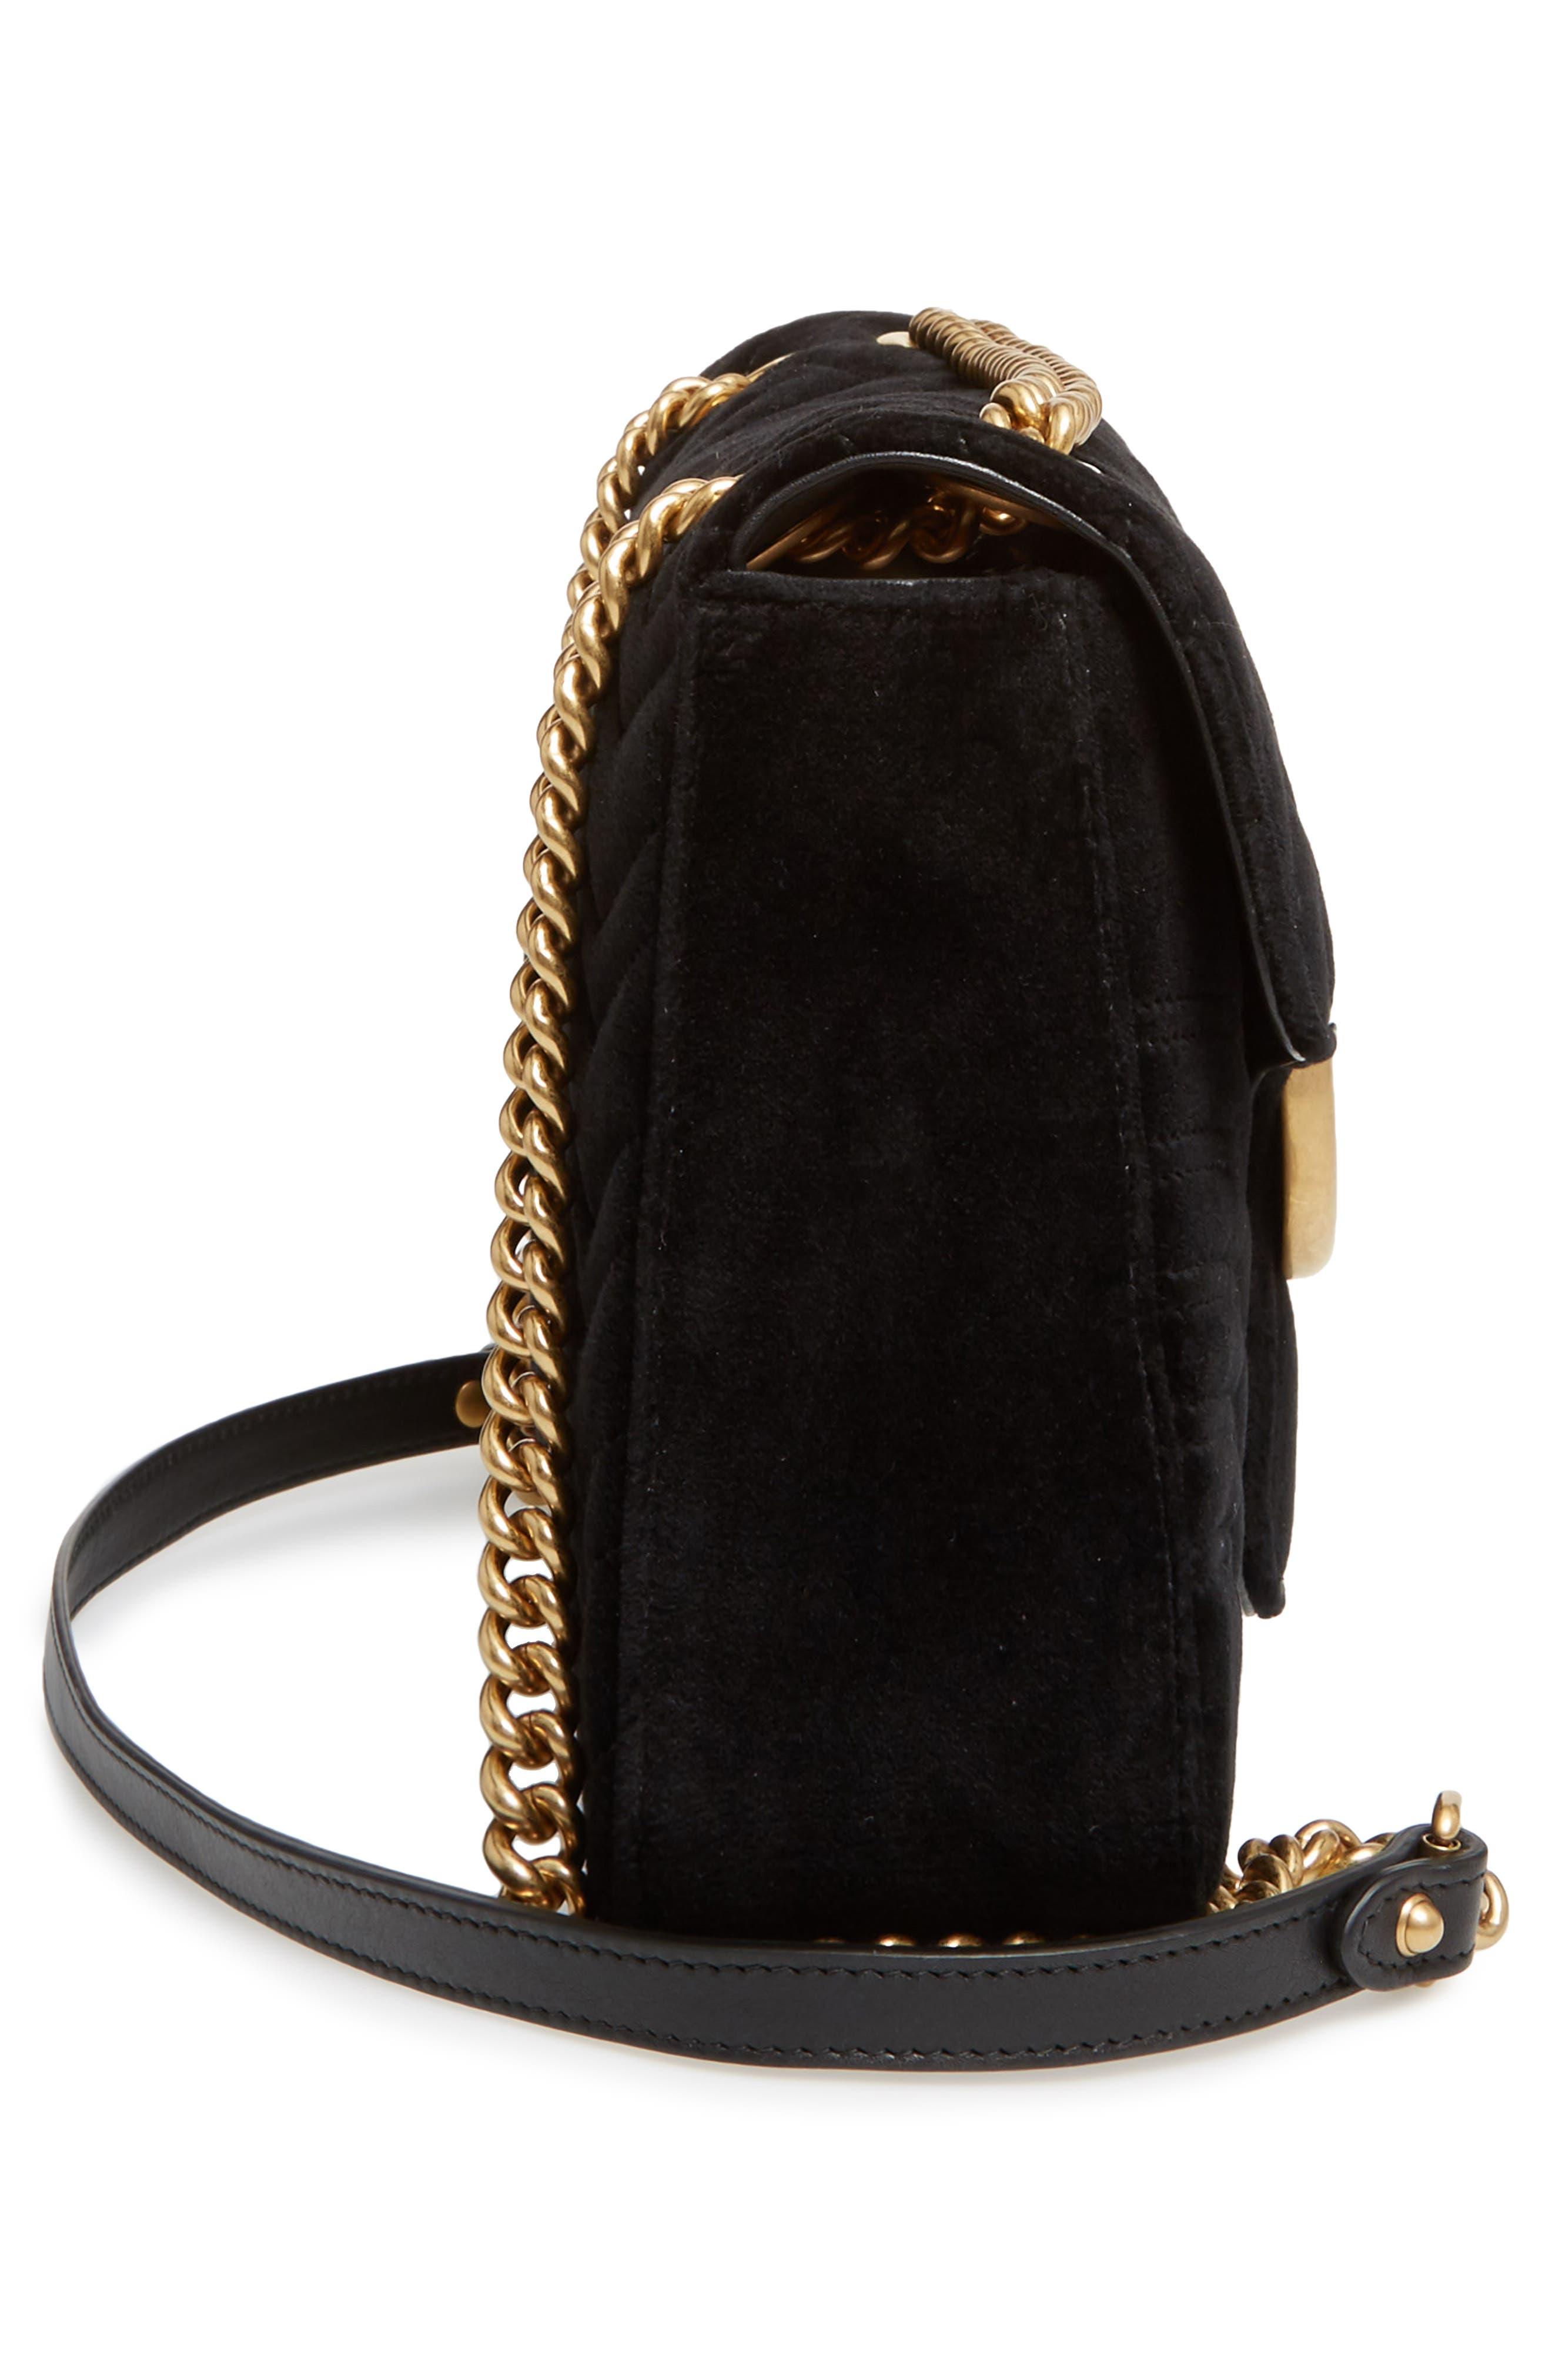 GUCCI, Medium GG Marmont 2.0 Matelassé Velvet Shoulder Bag, Alternate thumbnail 5, color, NERO